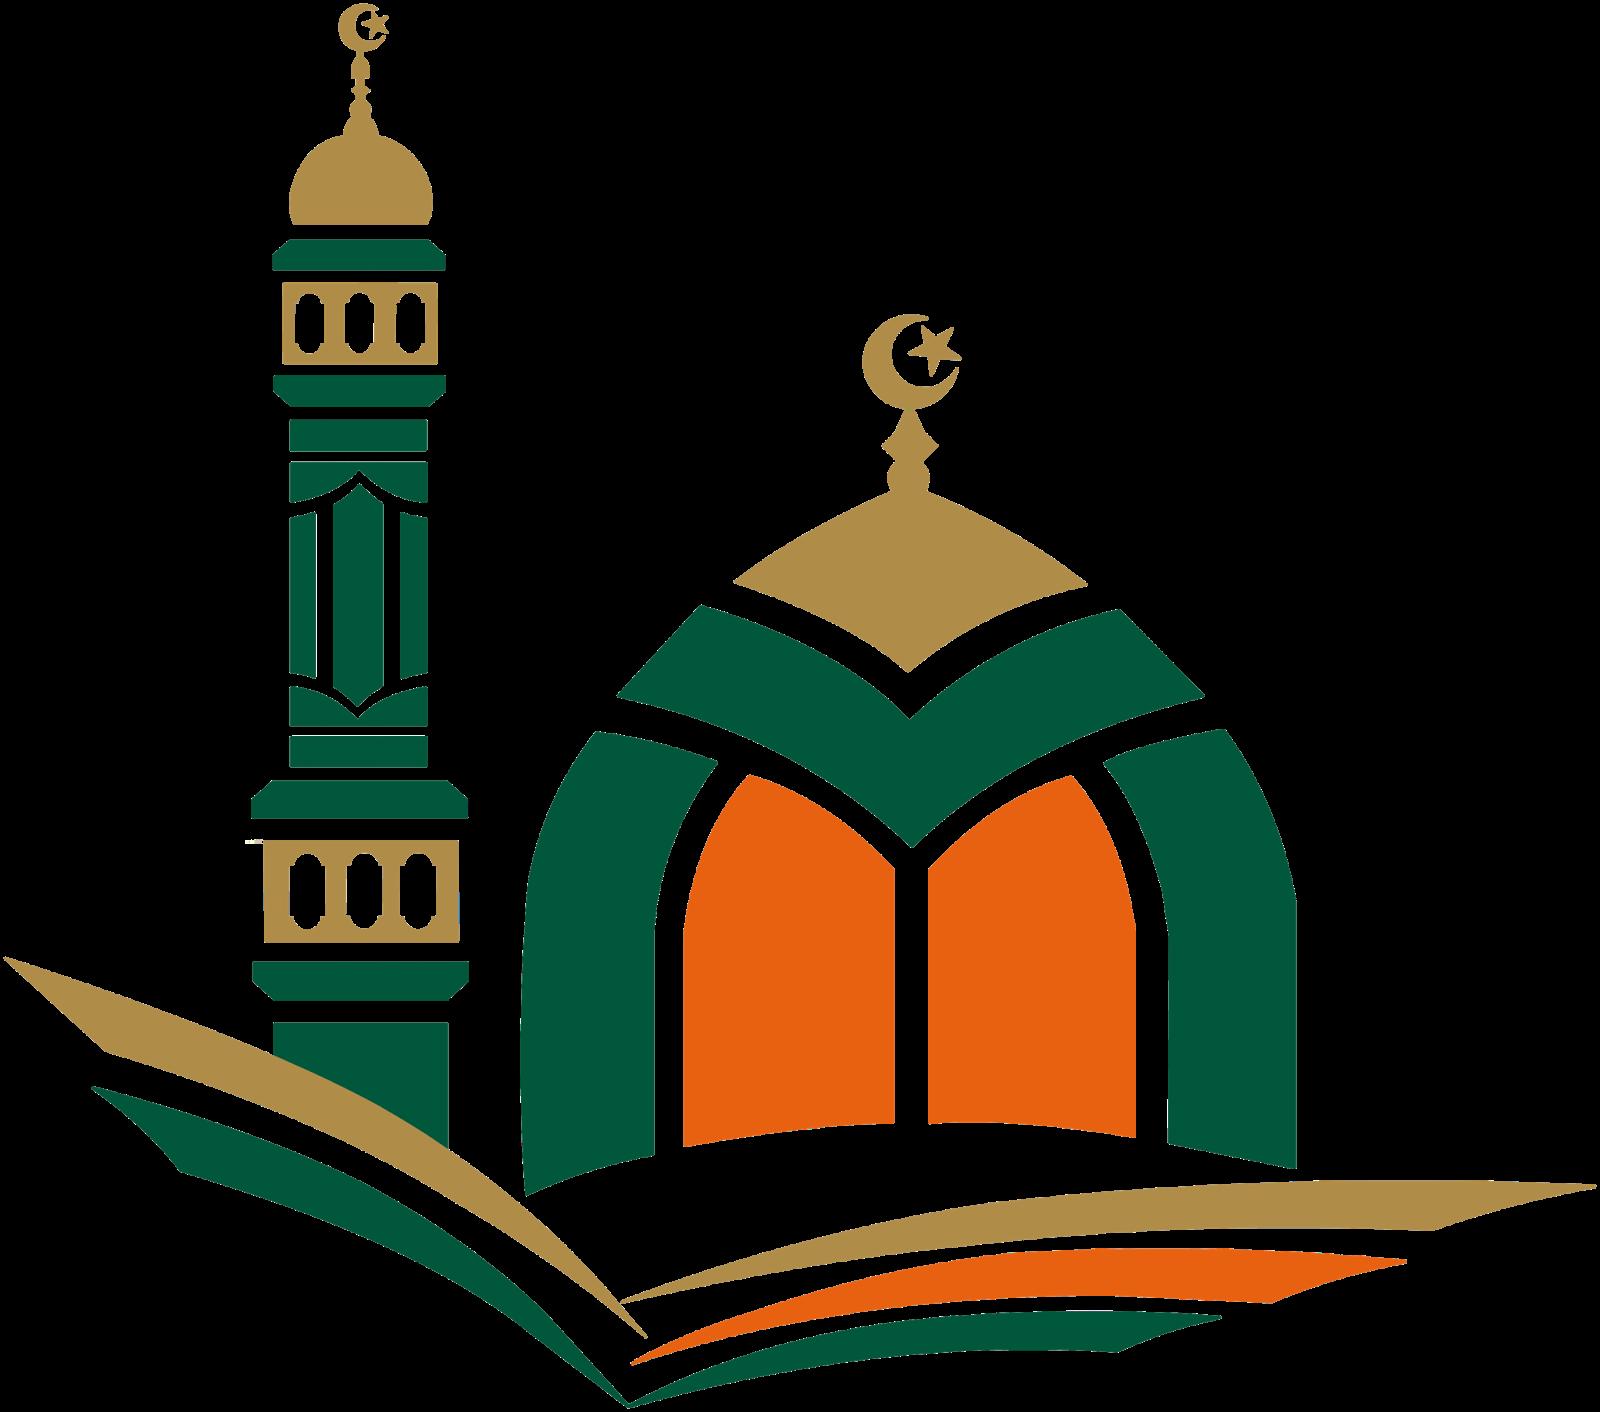 Stunning Cliparts Clipart Masjid Hitam Putih Fotomu